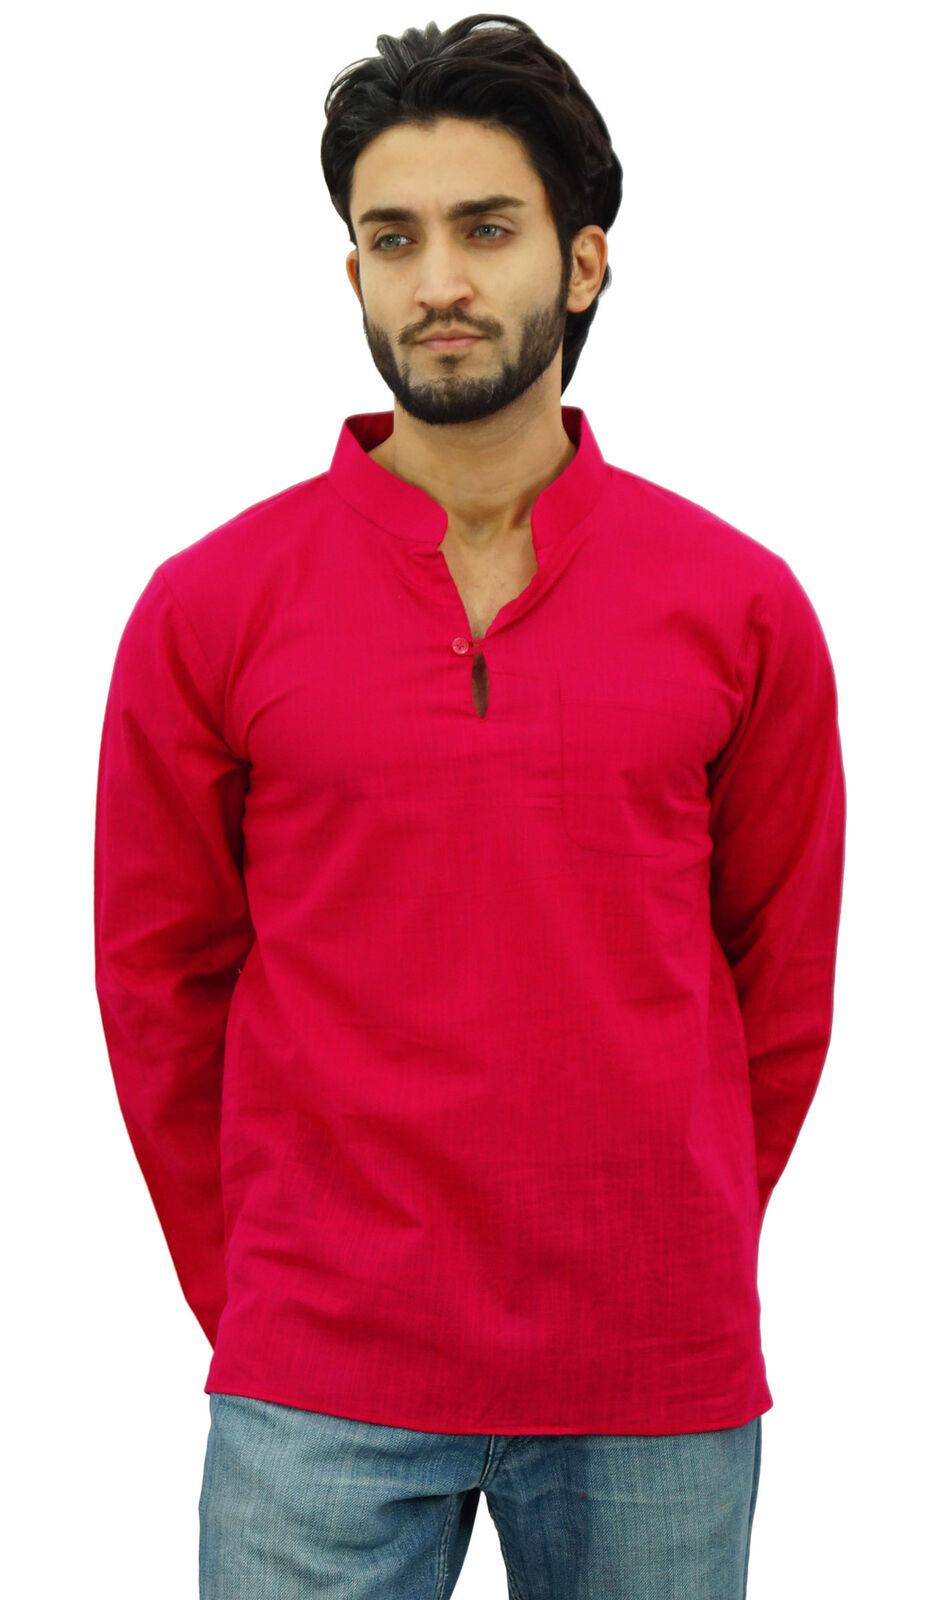 Atasi Men's Band Collar Short Kurta Fuchsia Cotton Casual Shirt-Small-wUr